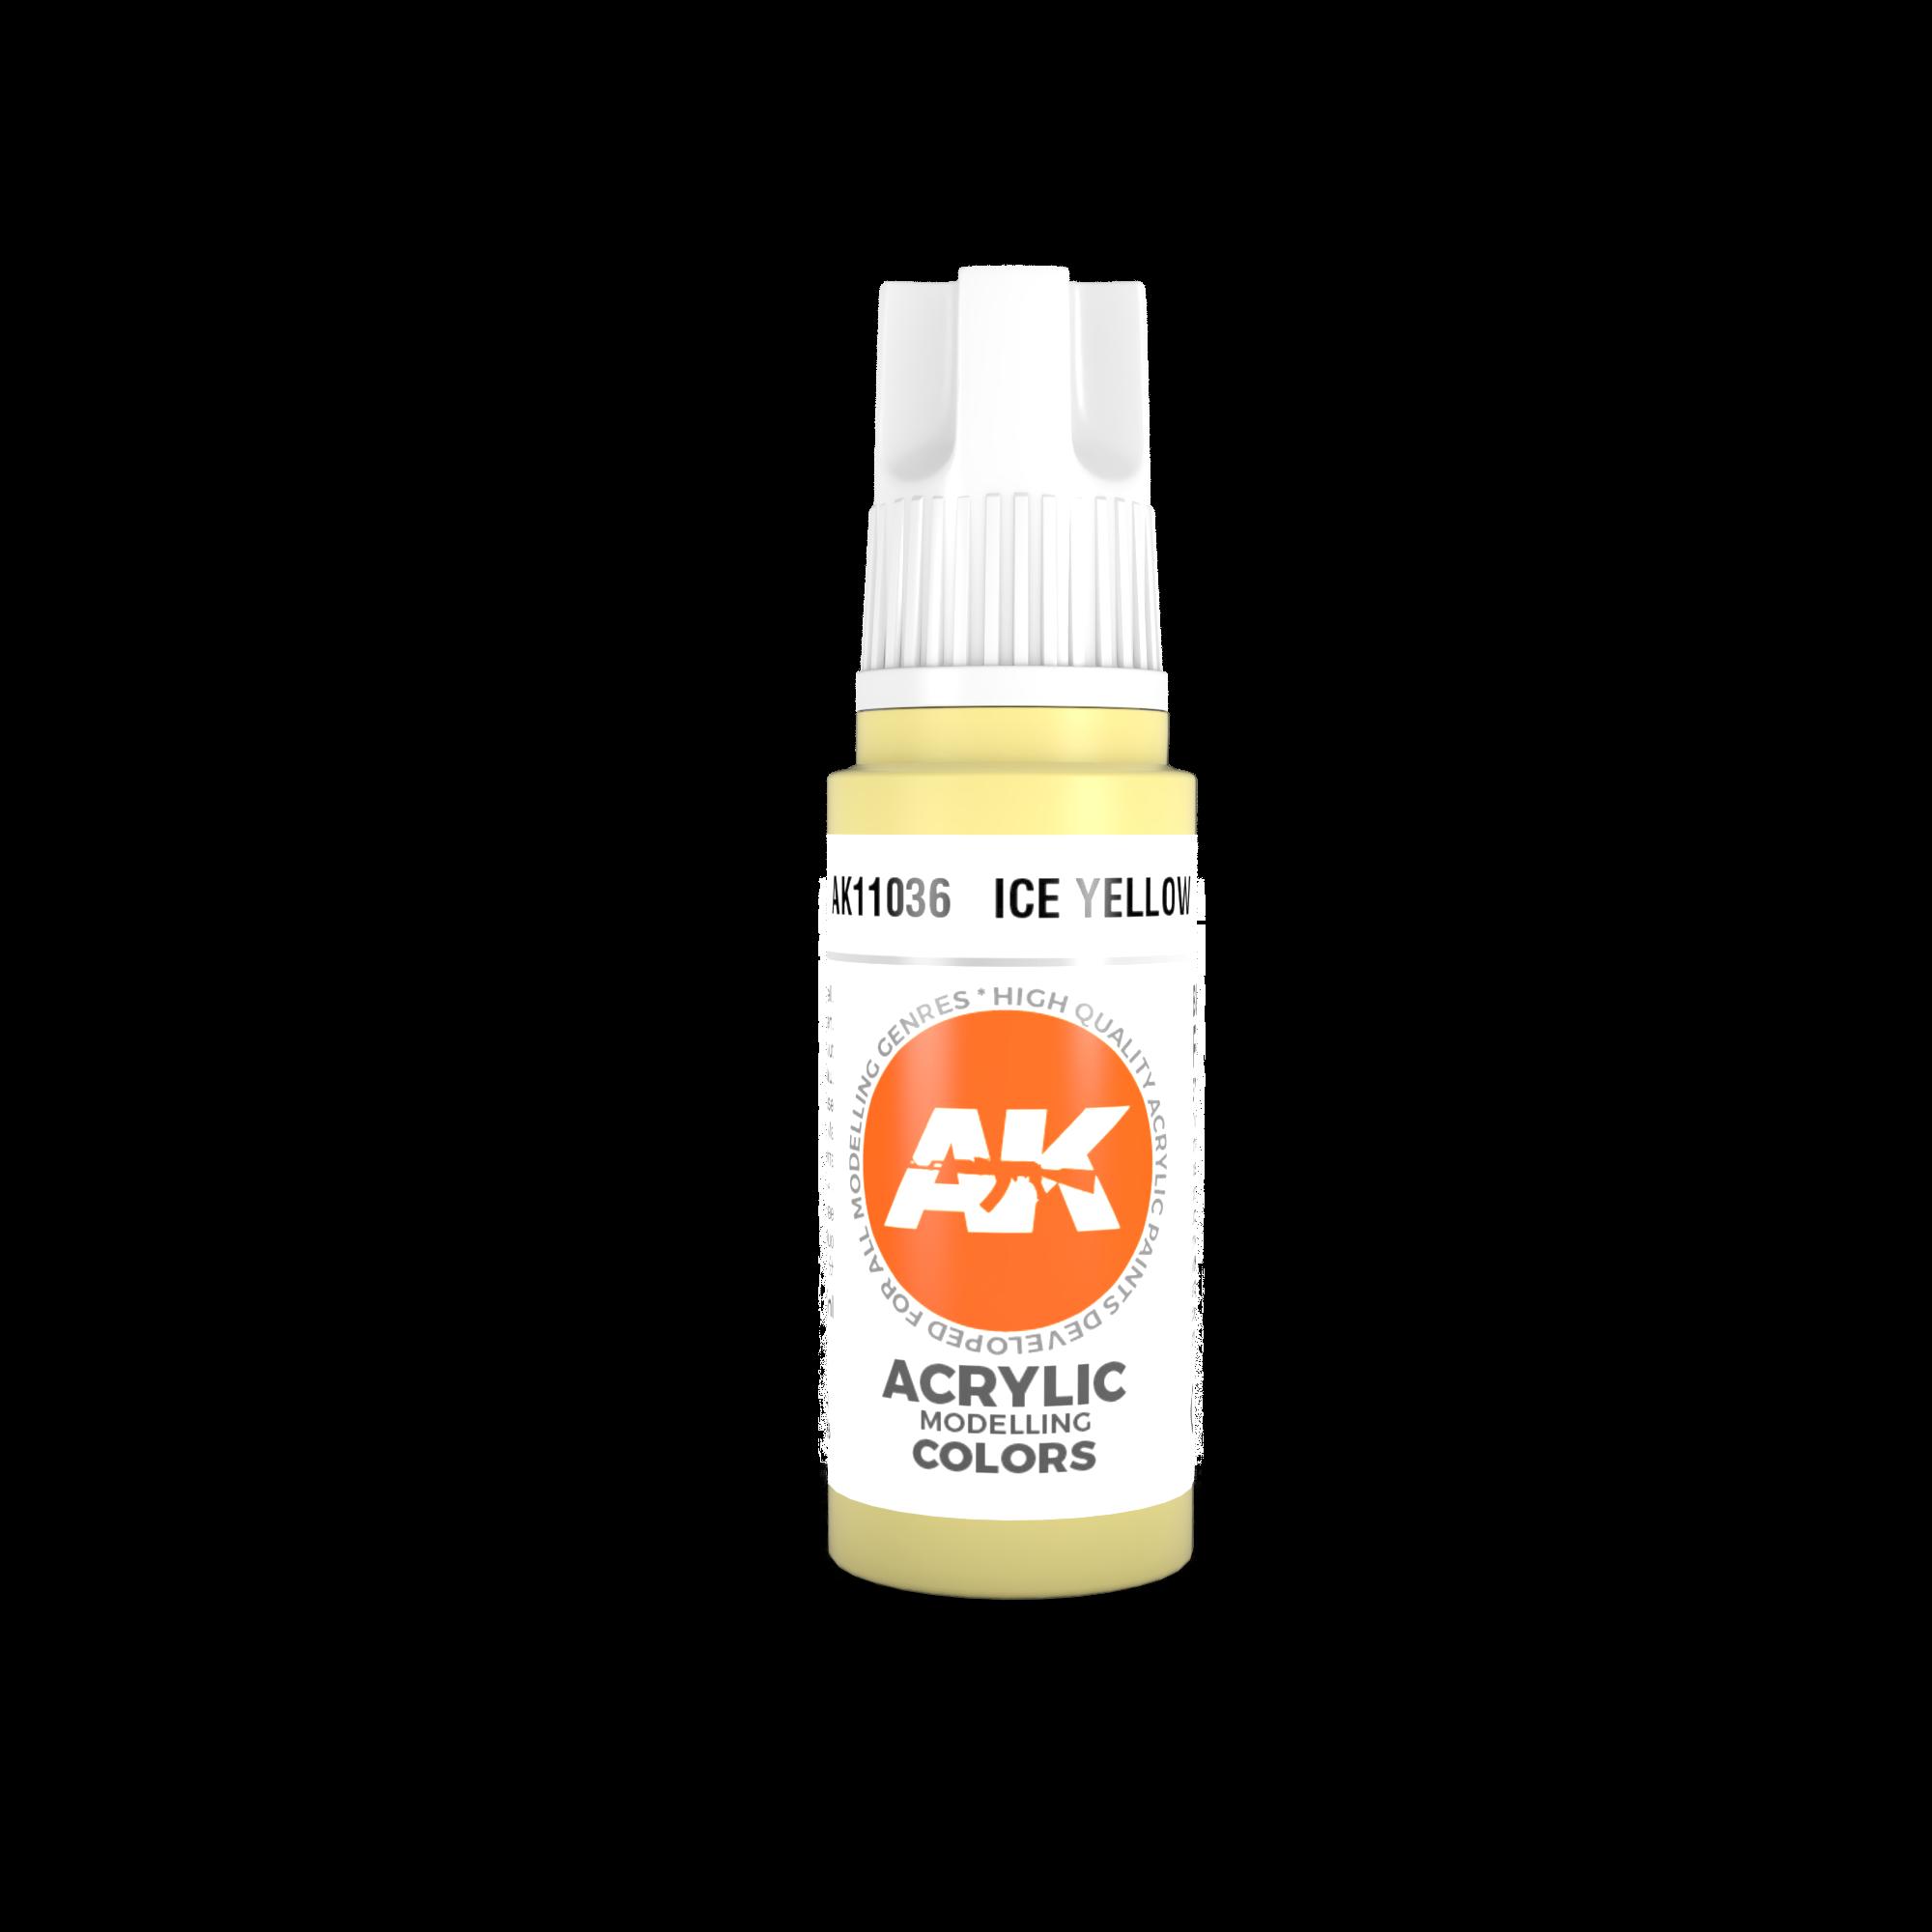 AK-Interactive Ice Yellow Acrylic Modelling Color - 17ml - AK-11036